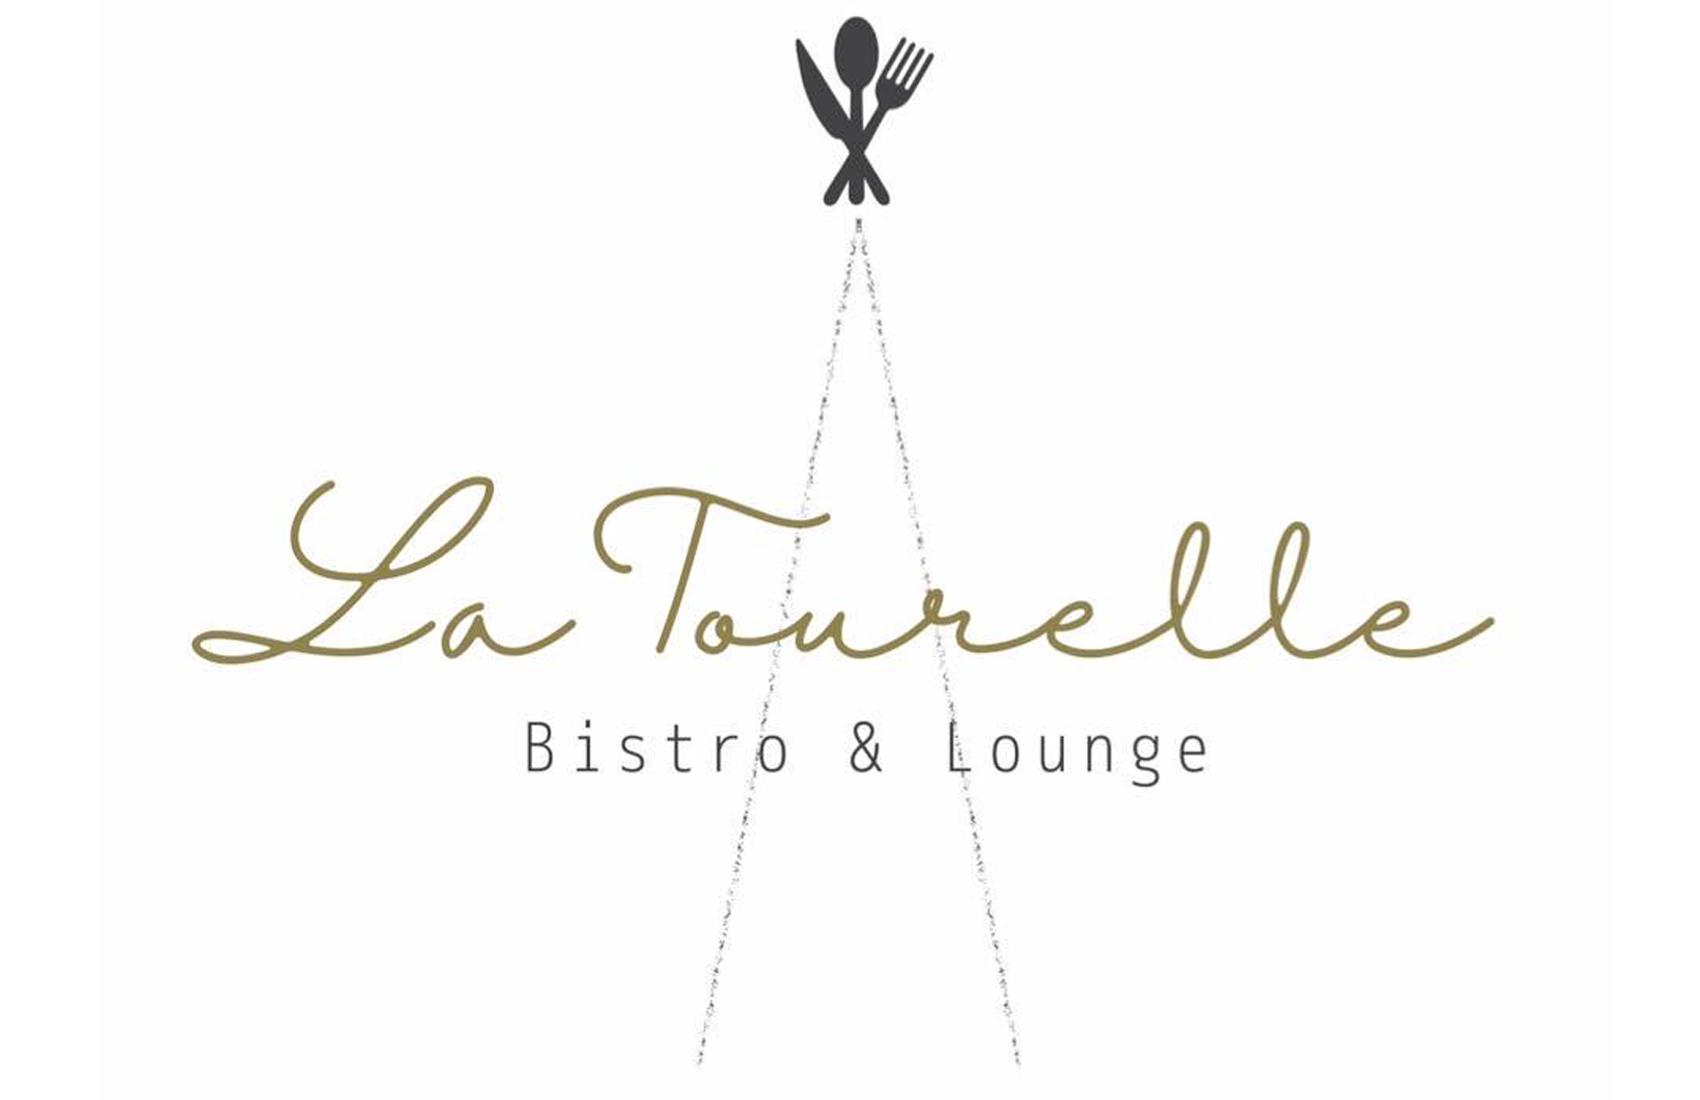 La Tourelle